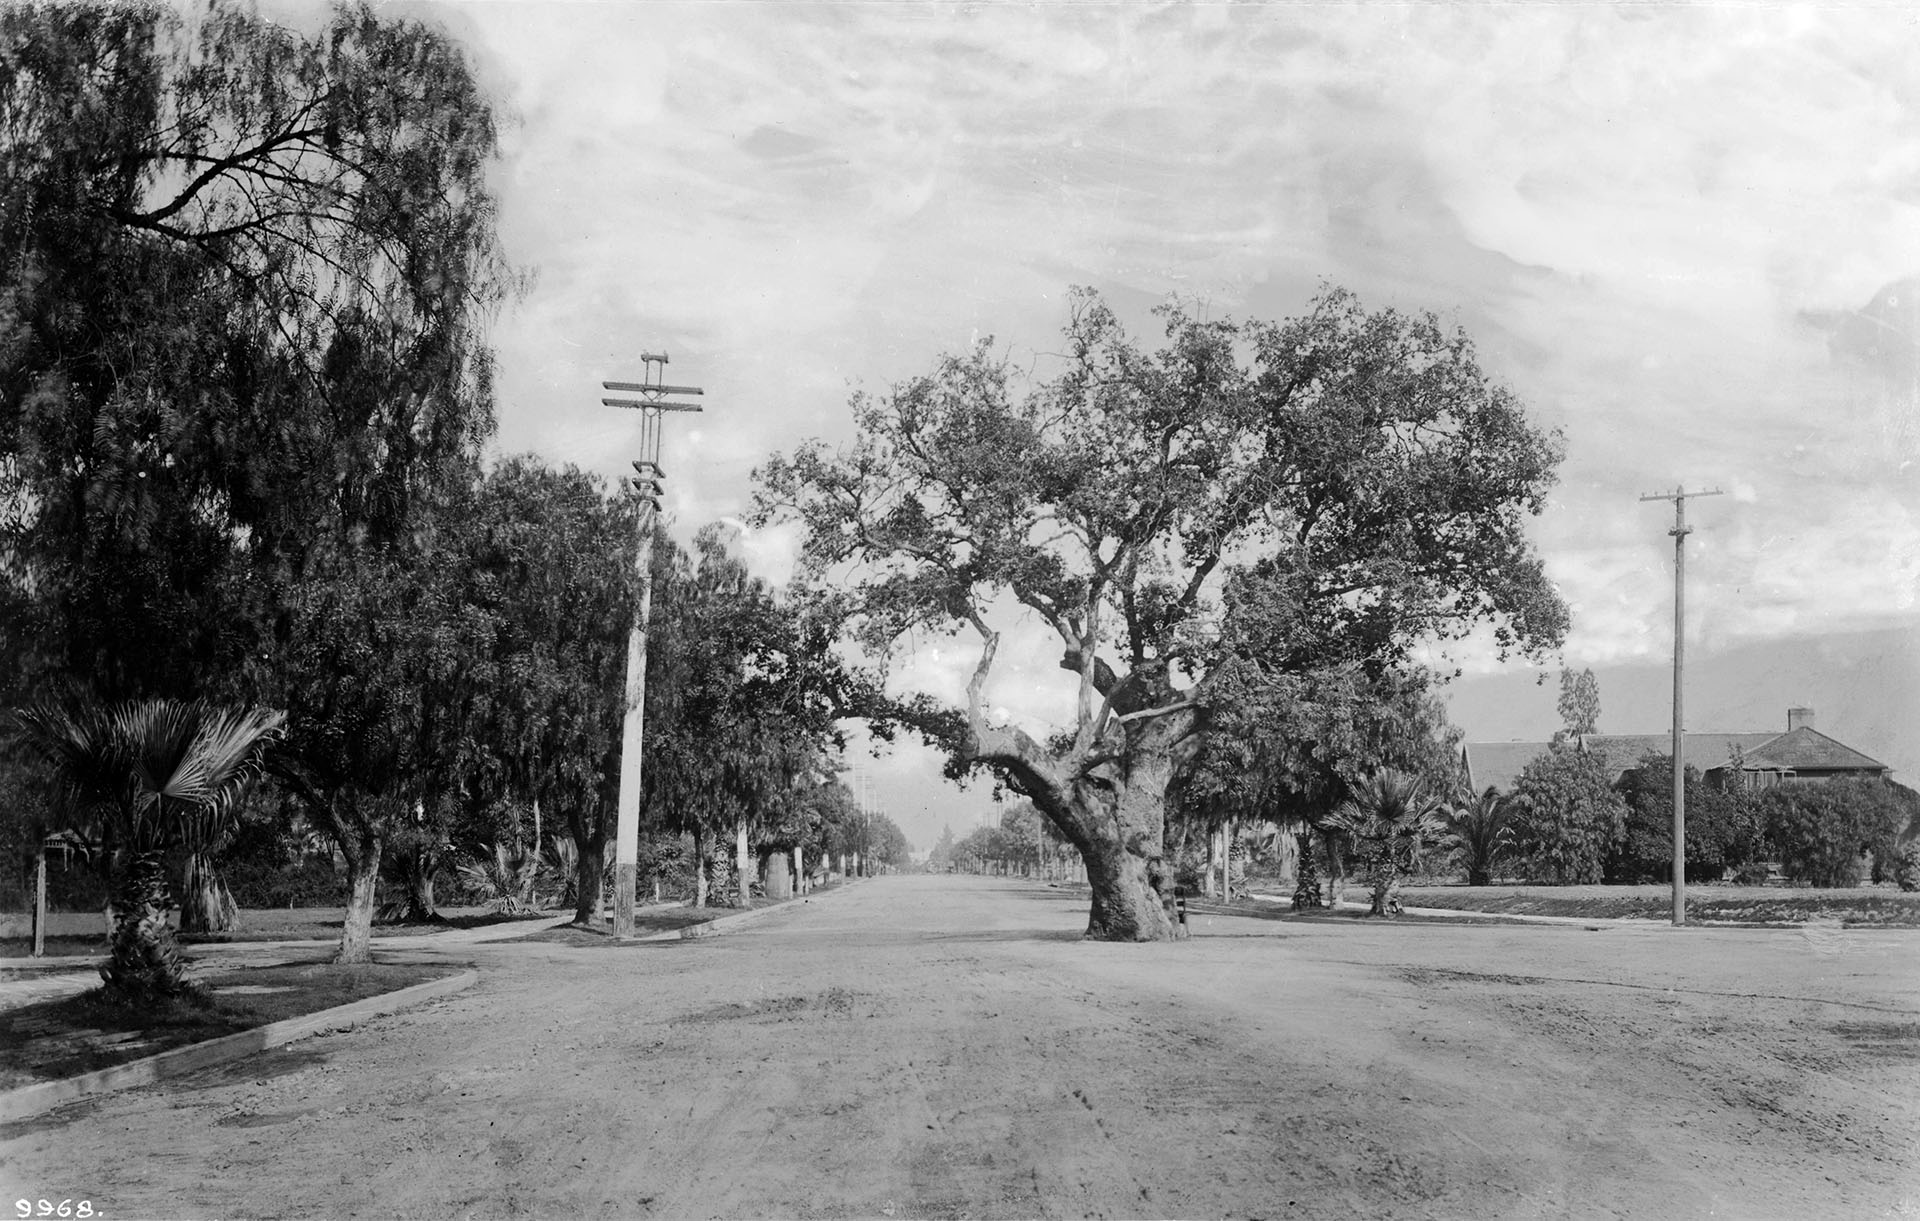 A live oak at Orange Grove and California in Pasadena